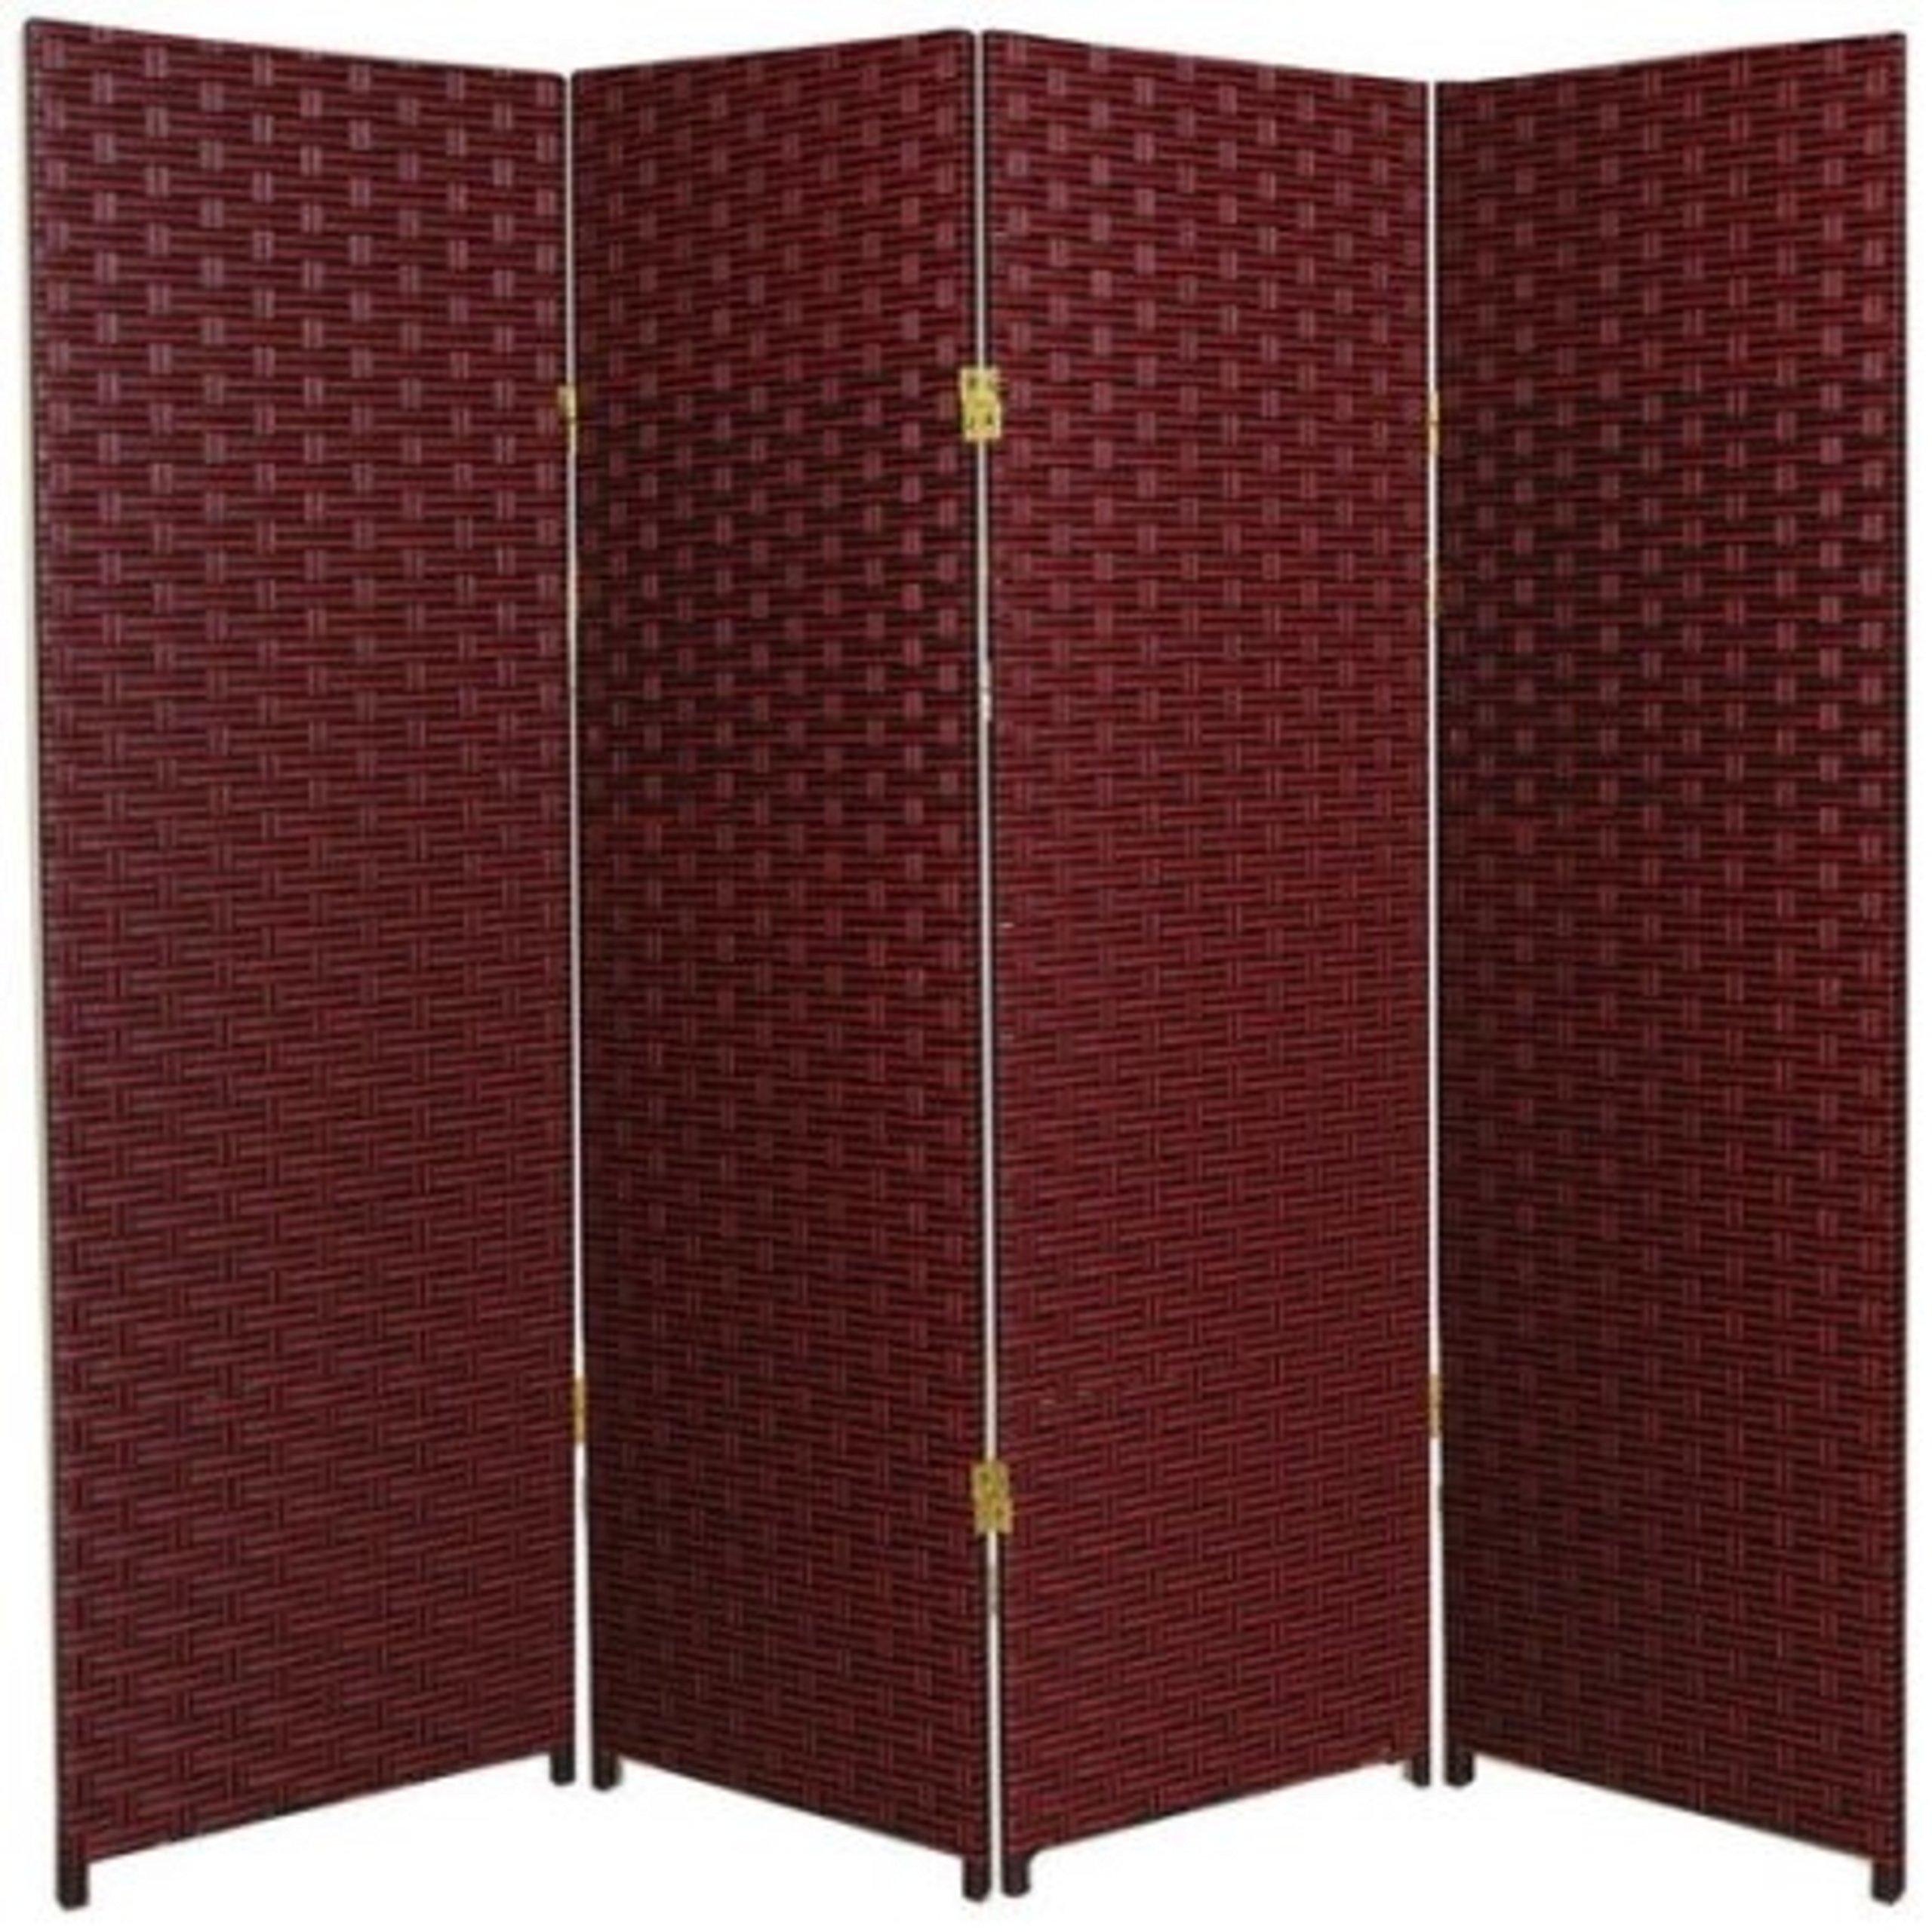 Natural Plant Fiber Woven Room Decor Red 4 Panels Divider